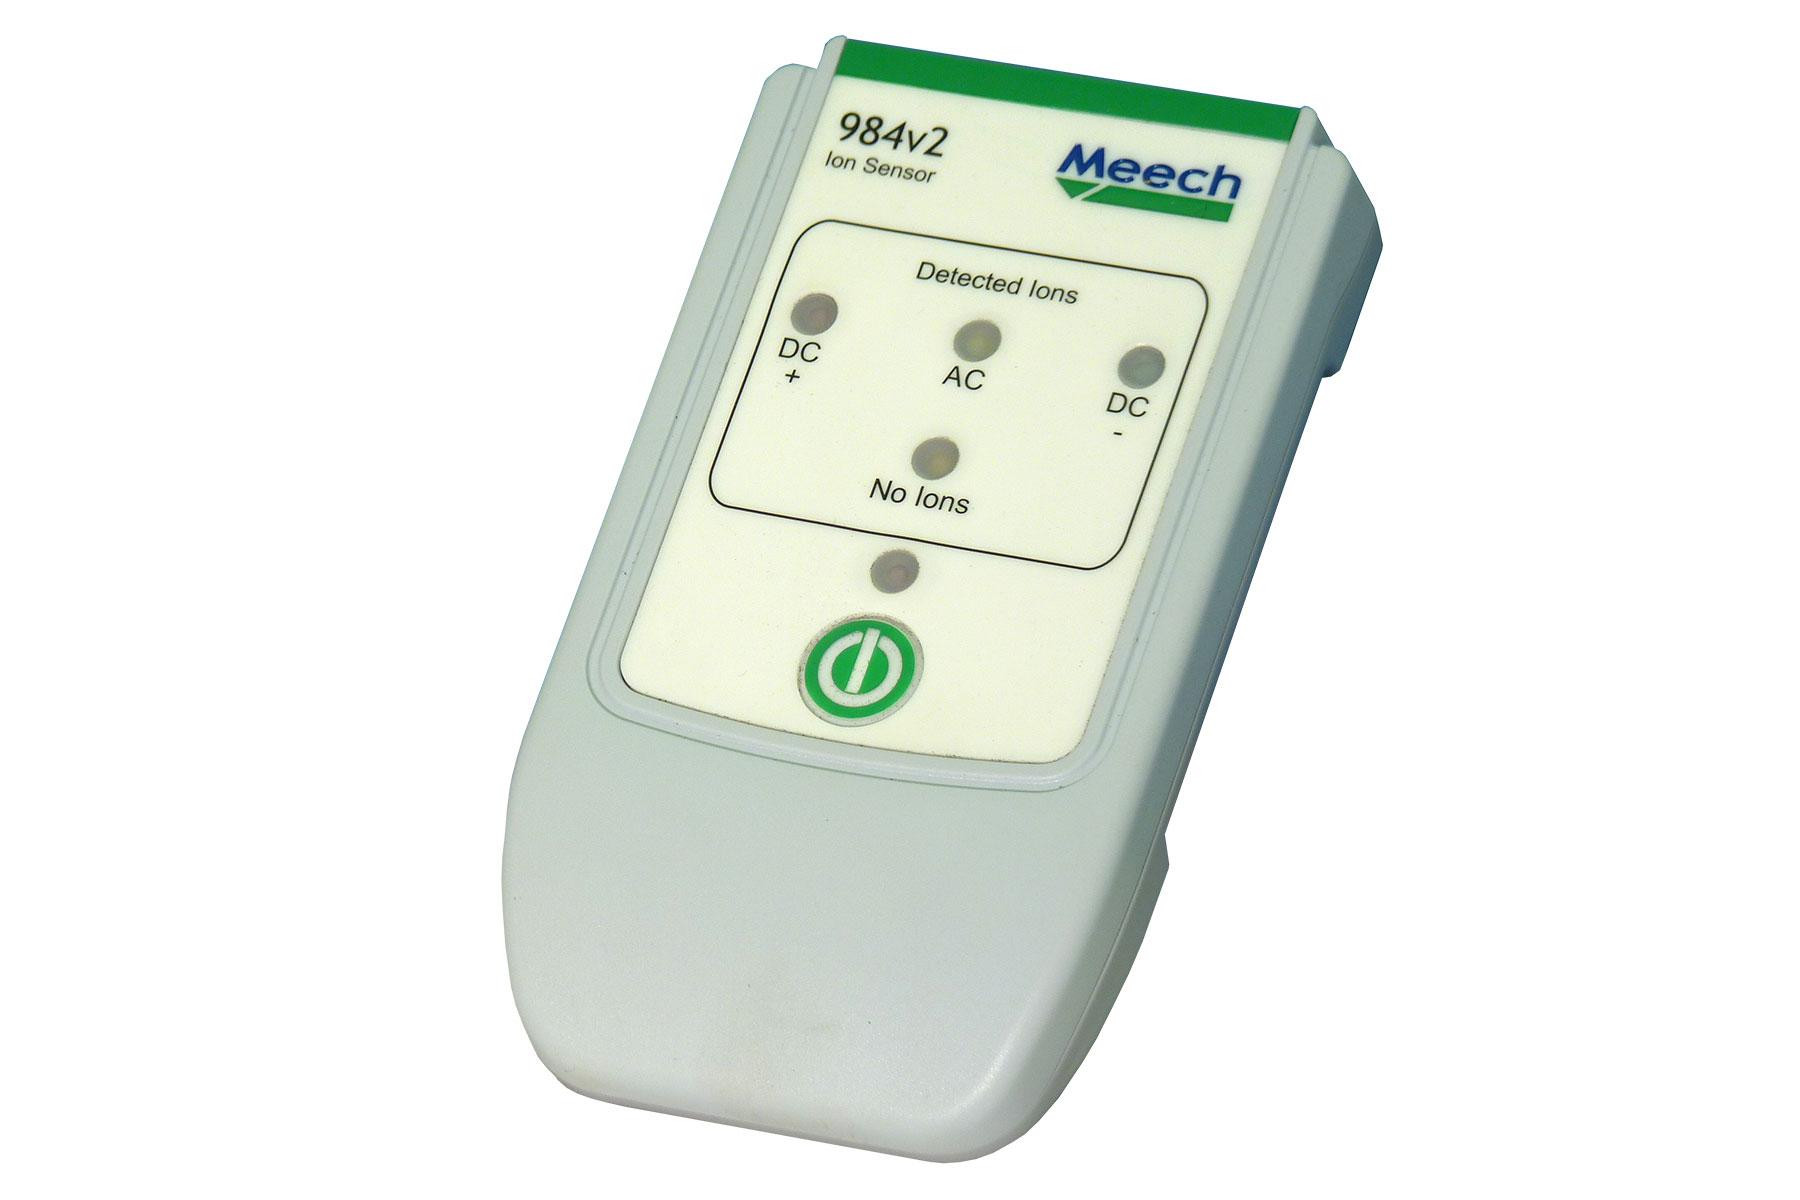 984v2 Ion Sensor